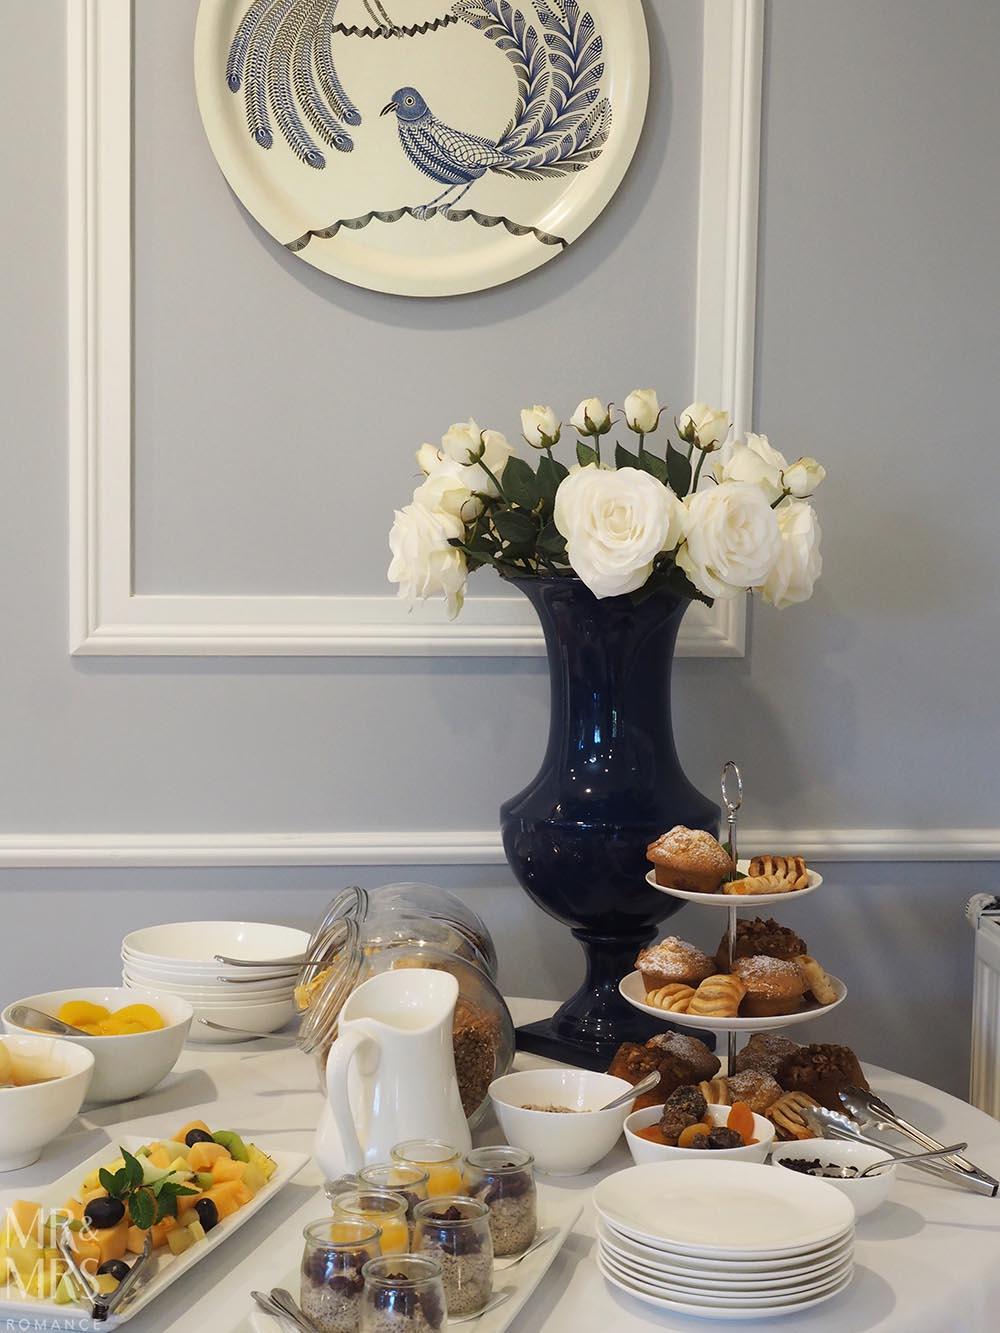 Henley Hotel - continental breakfast buffet